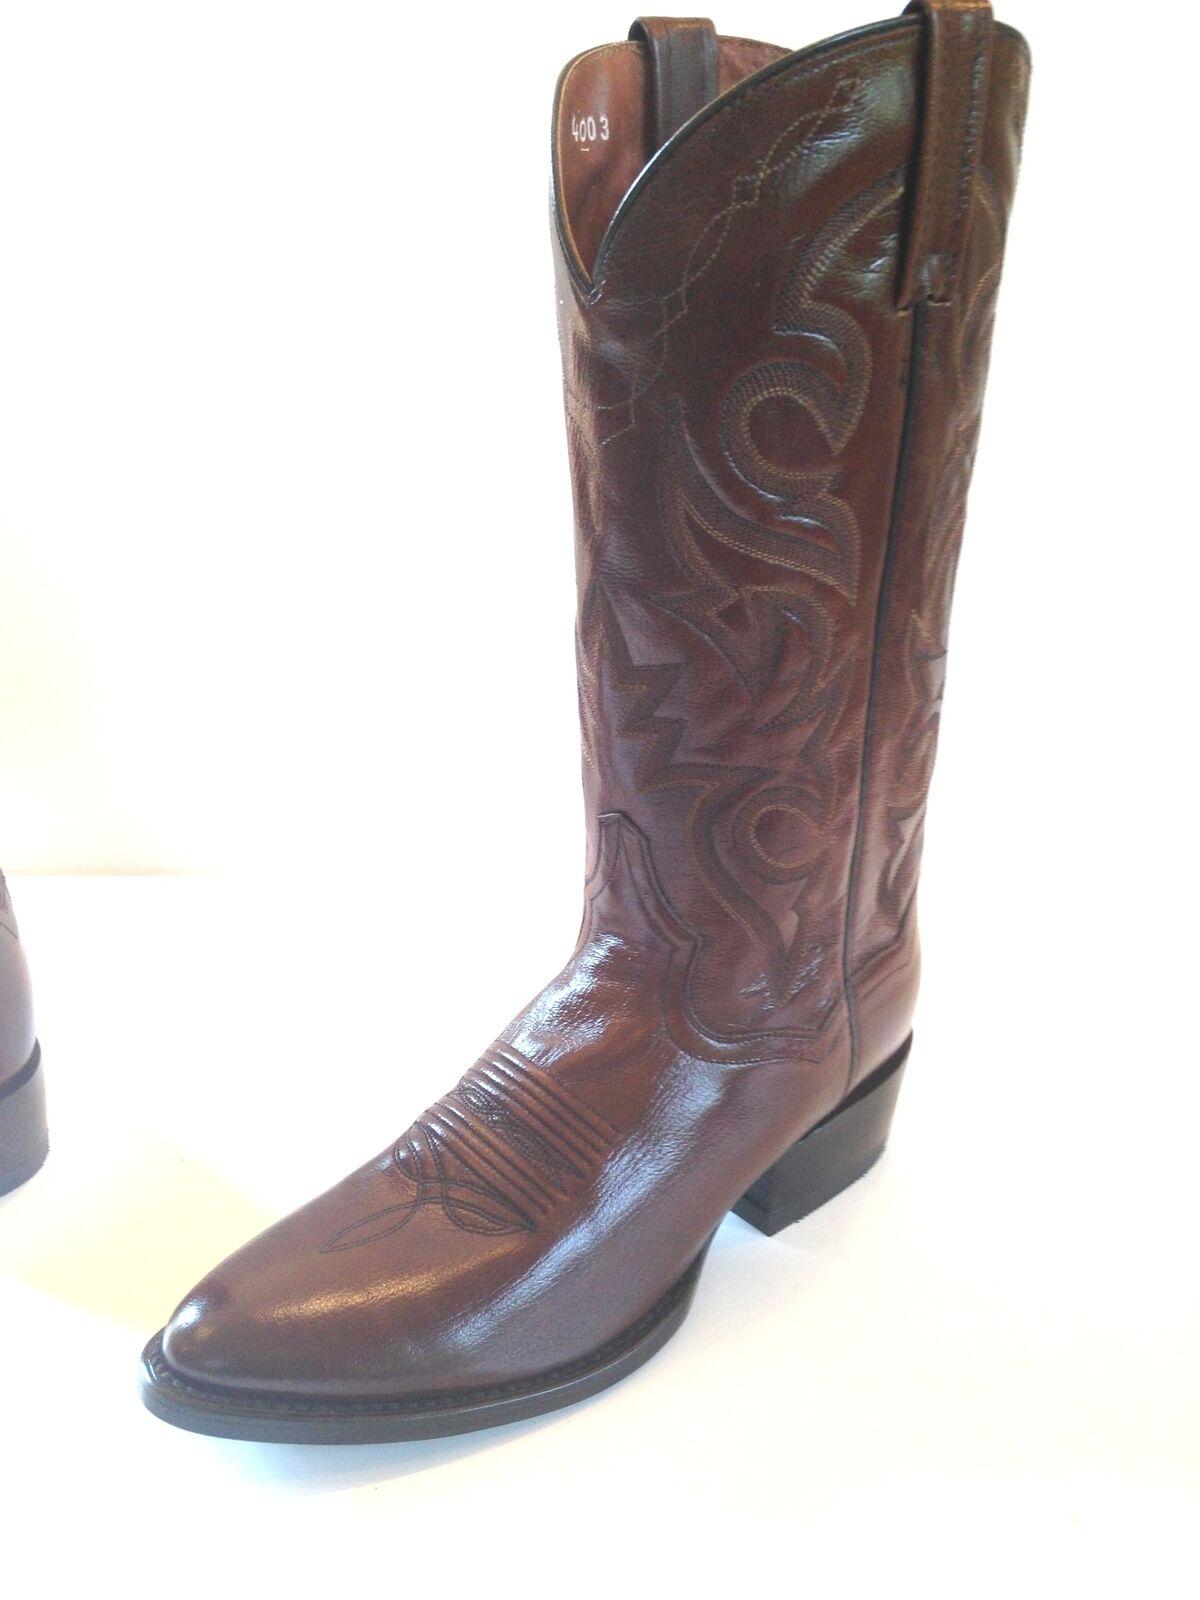 Dan Dan Dan Post Mens Mignon CGoldna Leather Western Stiefel DP211R Antique Tan Größe 7.5D 4c5178